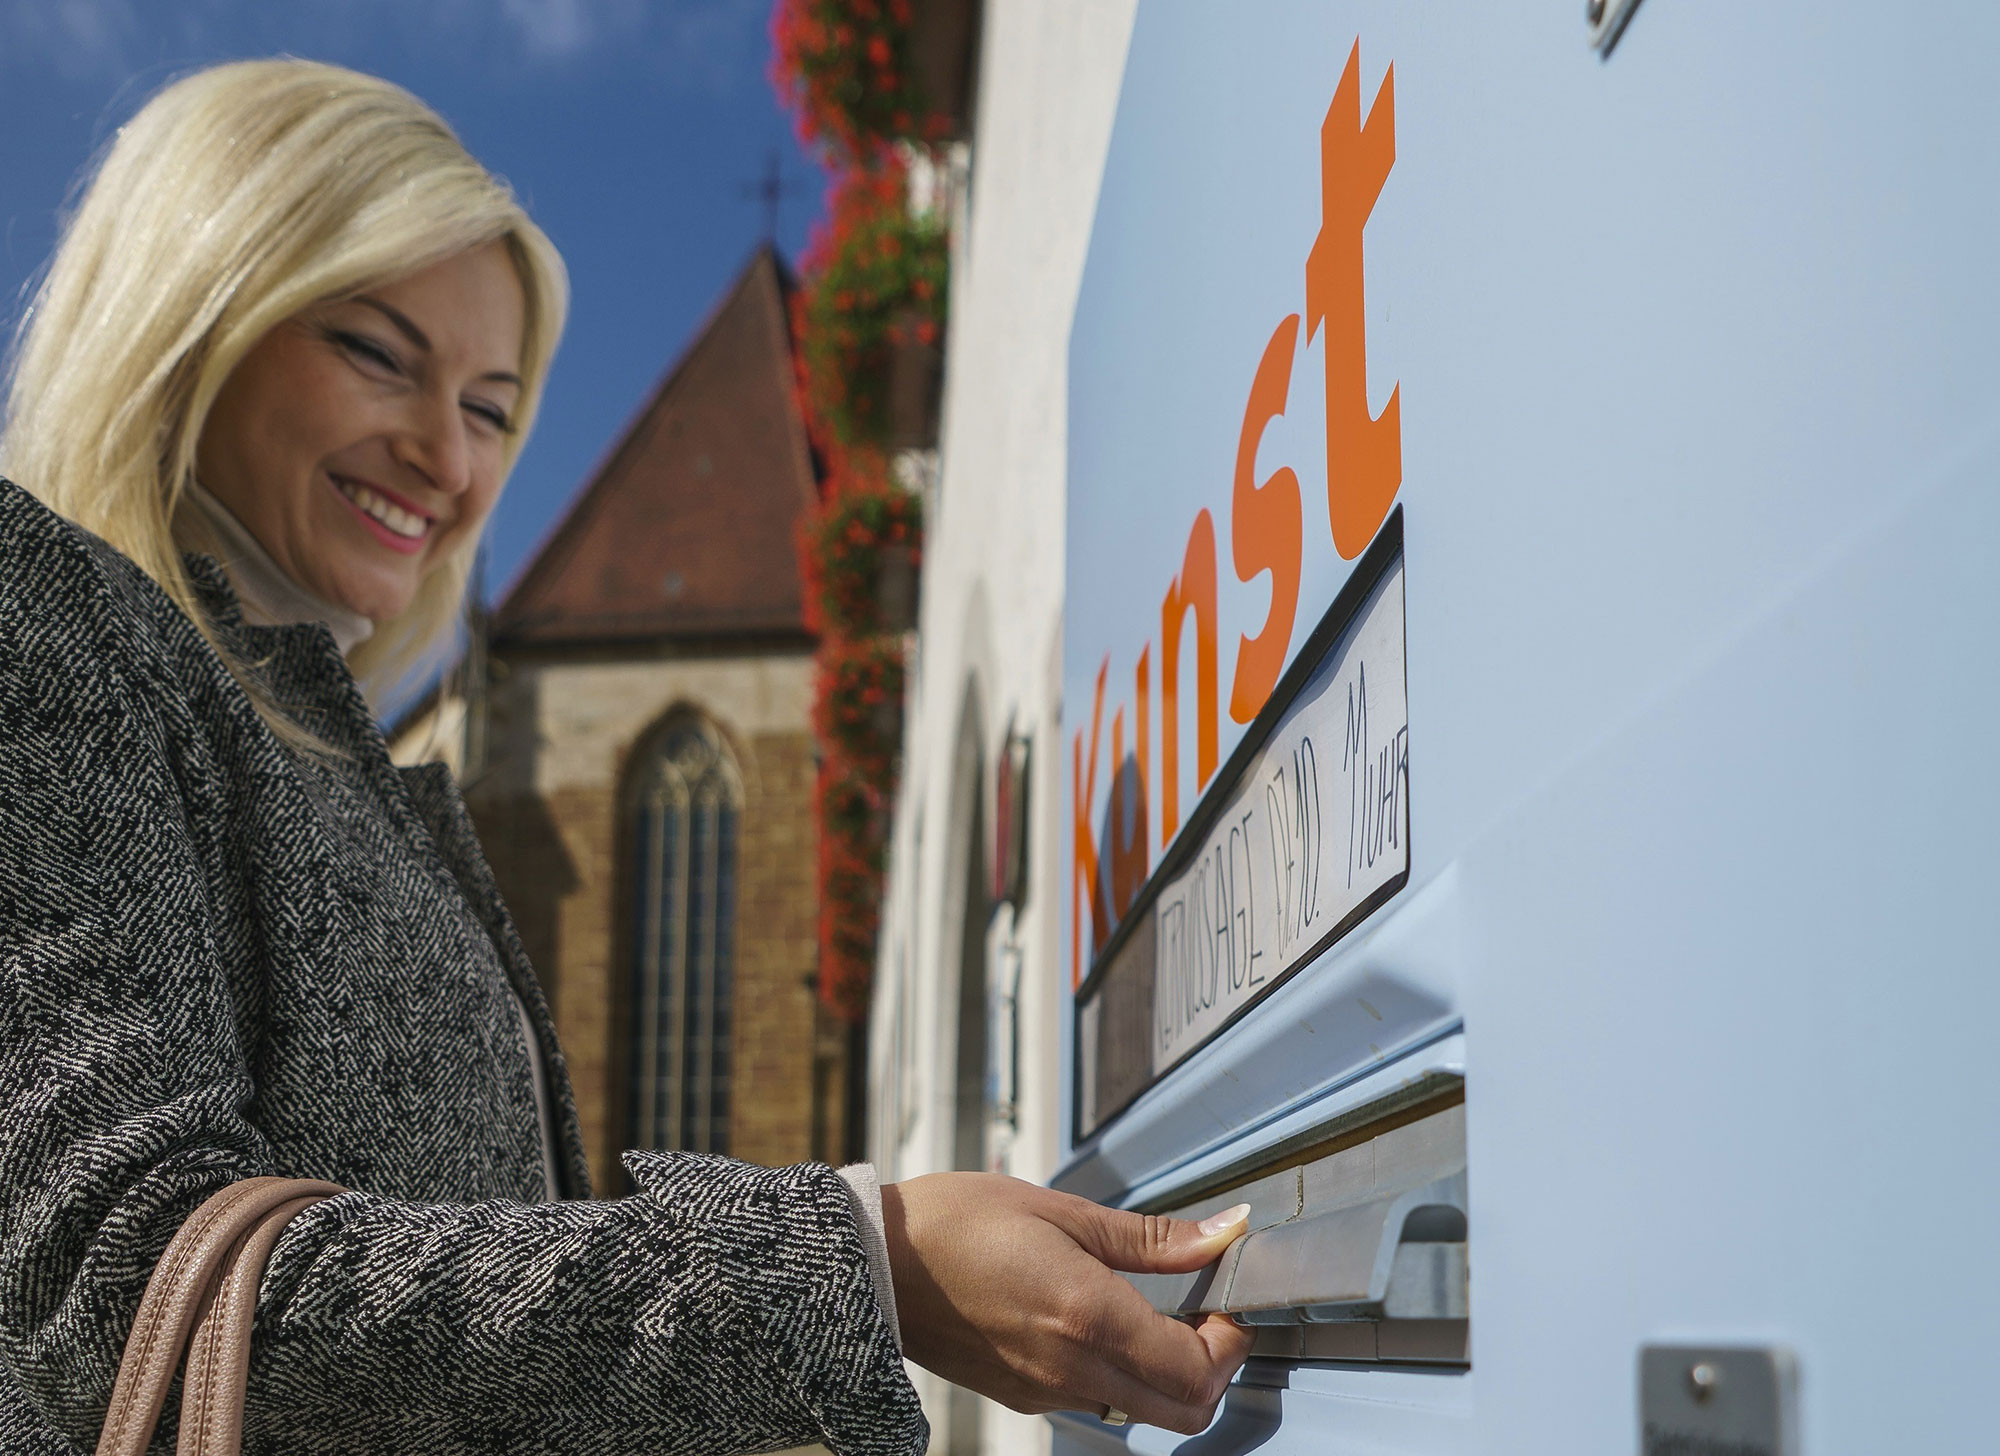 """Kunst ohne Filter"" aus dem Zigarettenautomat"